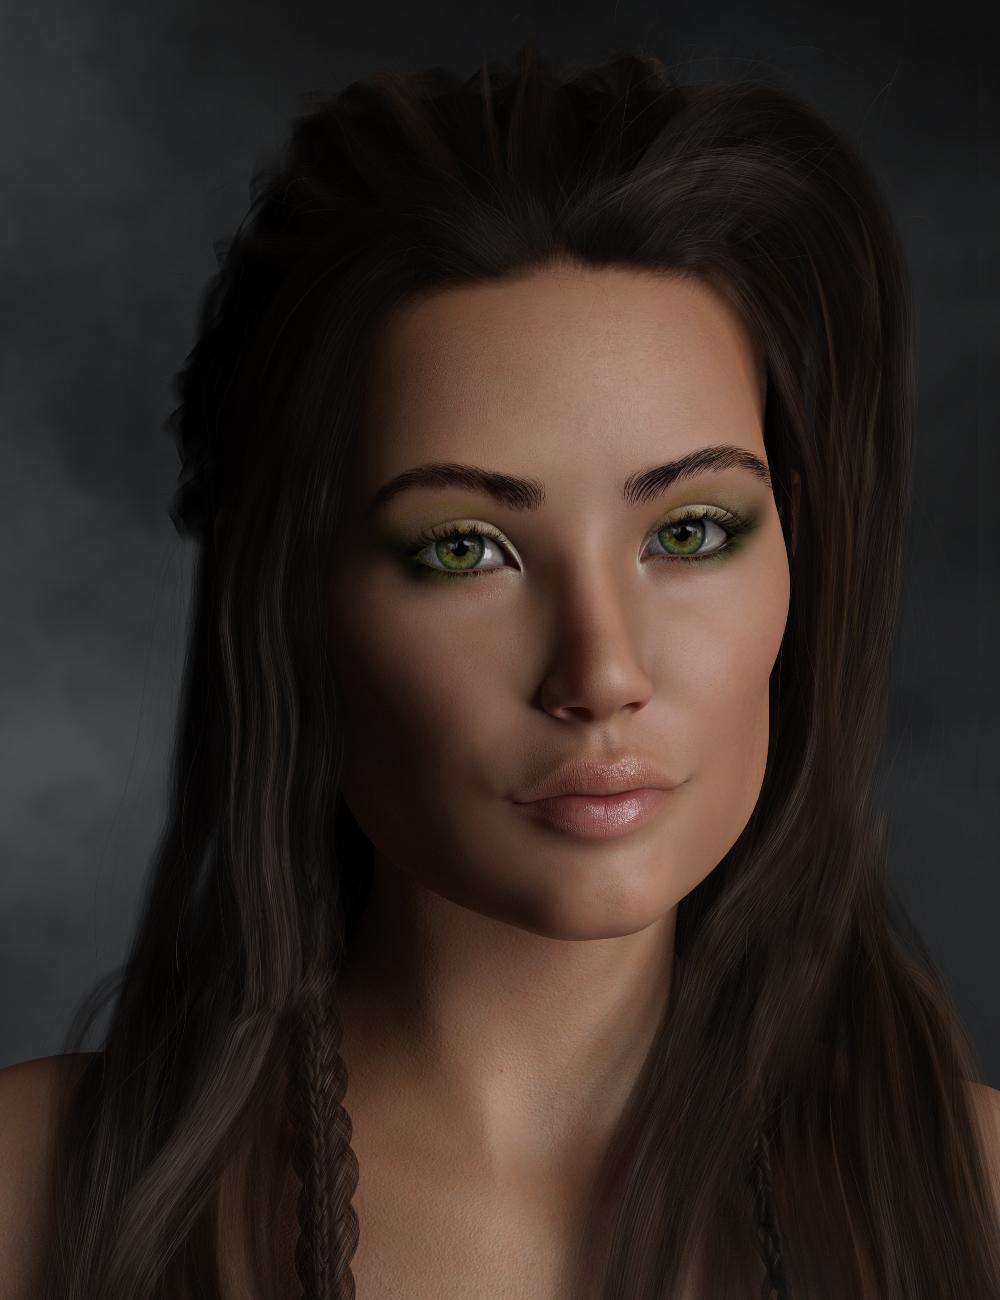 Dysis for Ellithia 8 by: OziChickSR3, 3D Models by Daz 3D